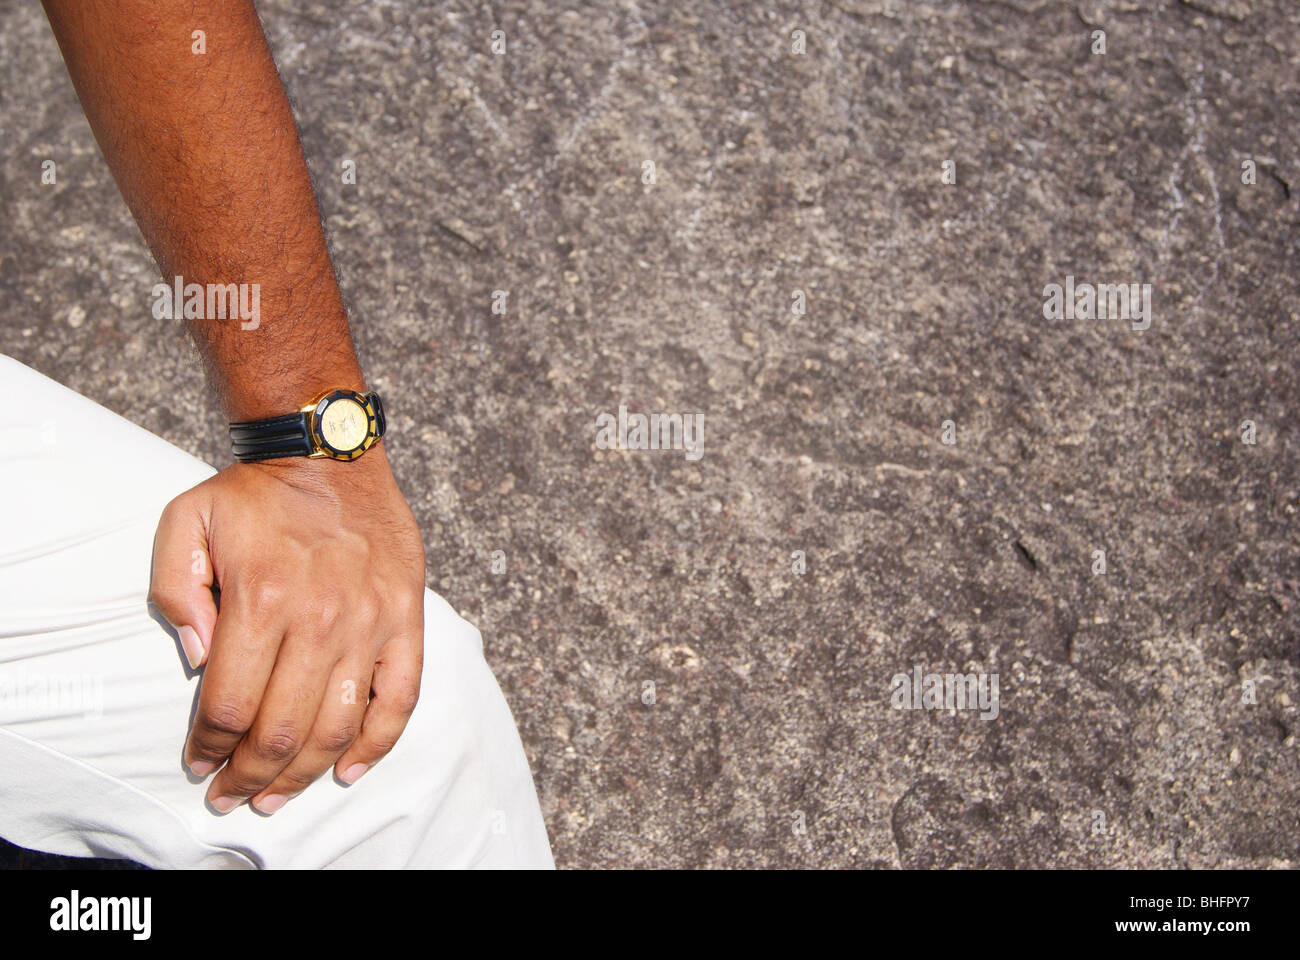 Stylish Hand in blurred Hard Rock background - Stock Image